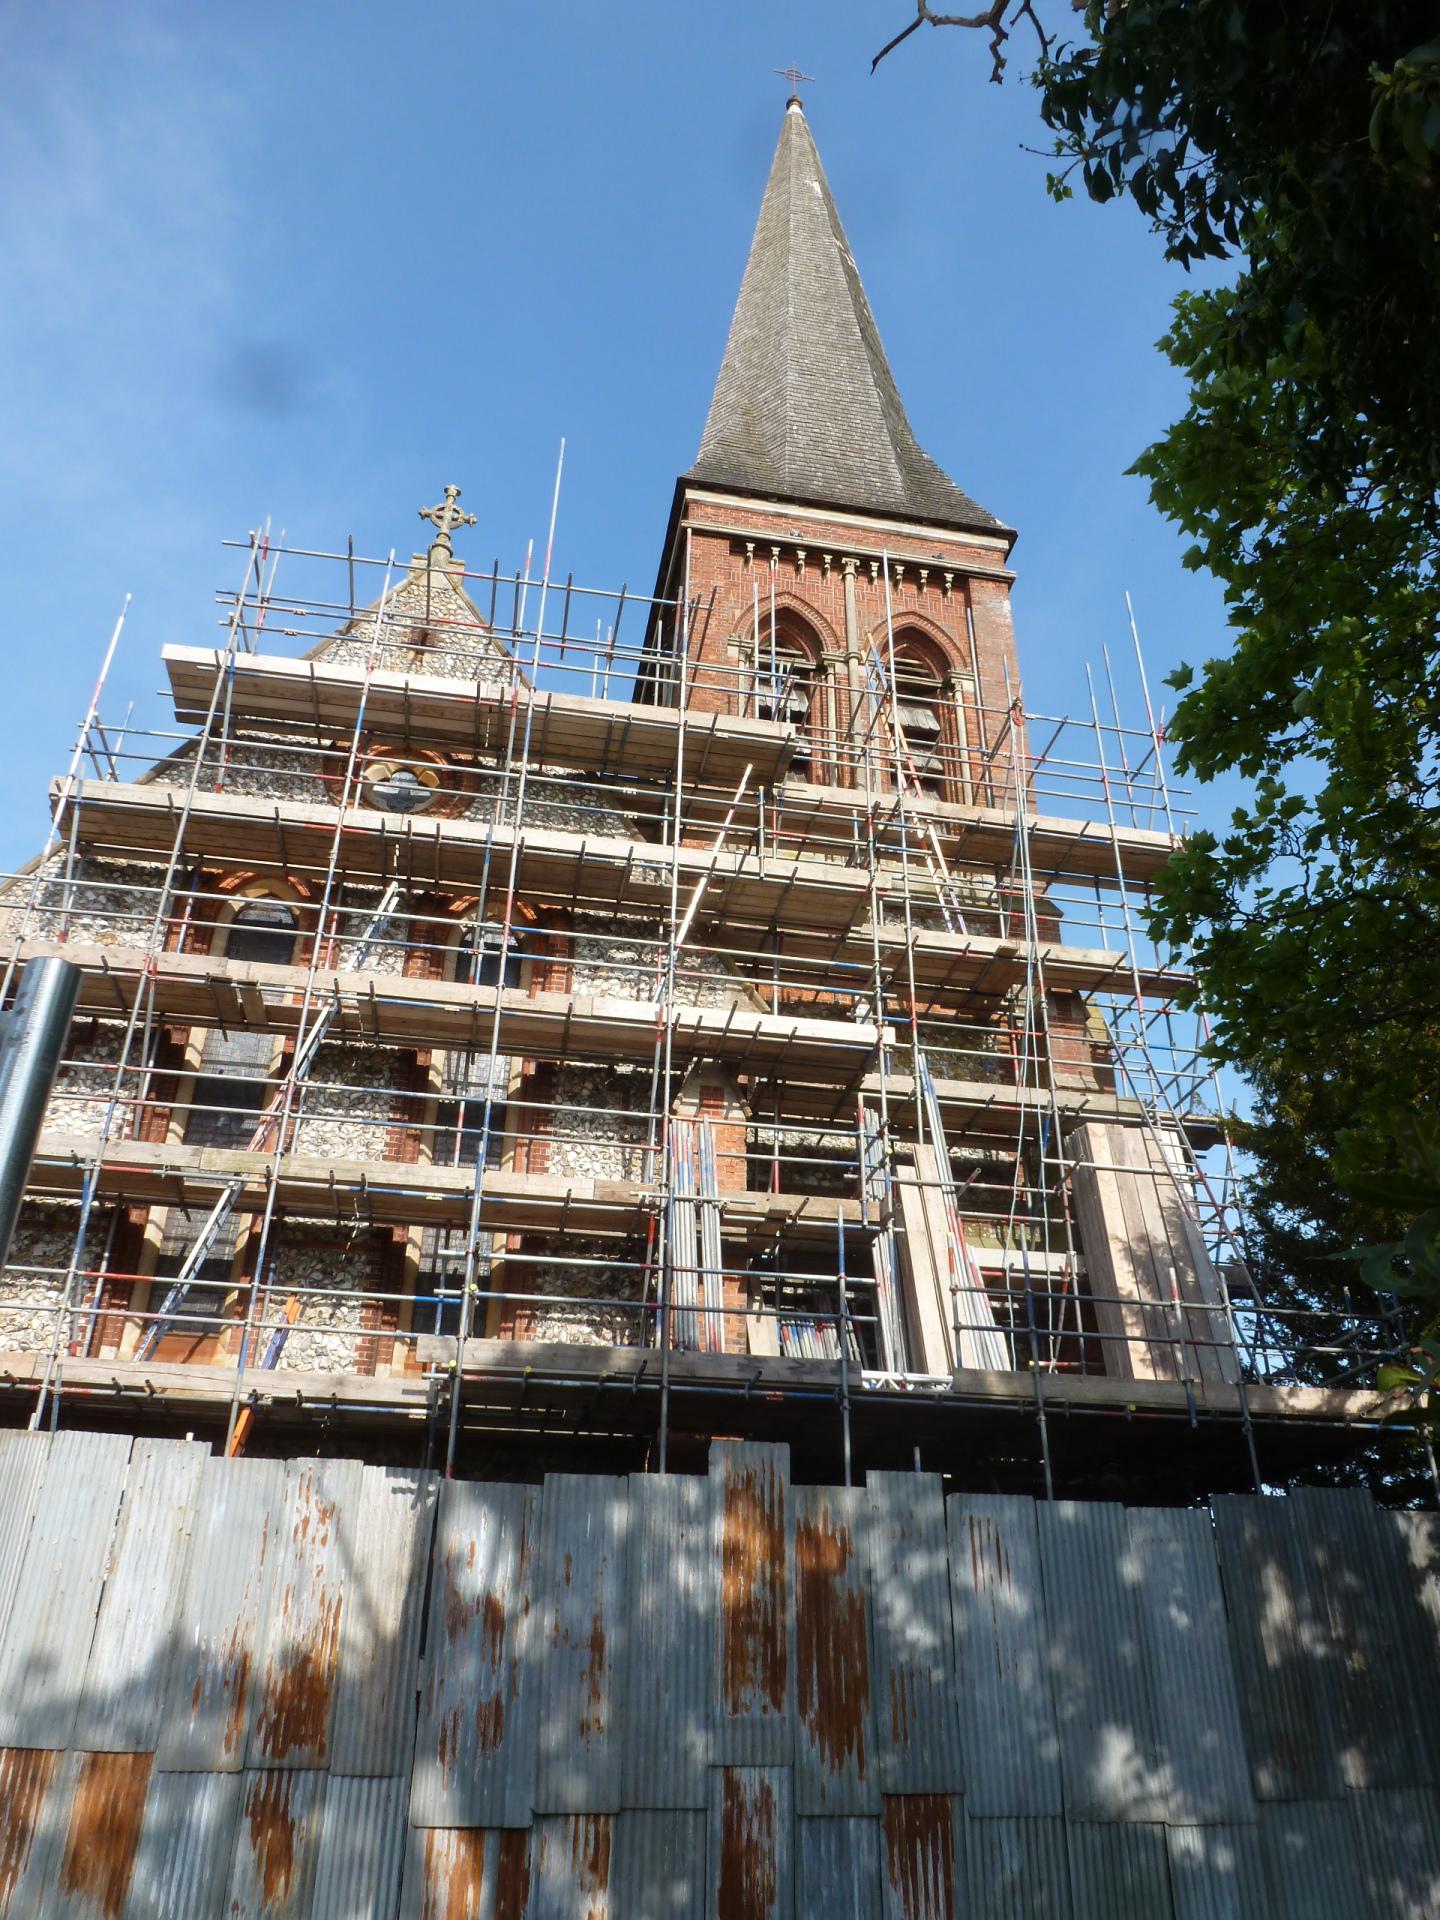 St. Botolph's, Heene, scaffolding 12.5.16